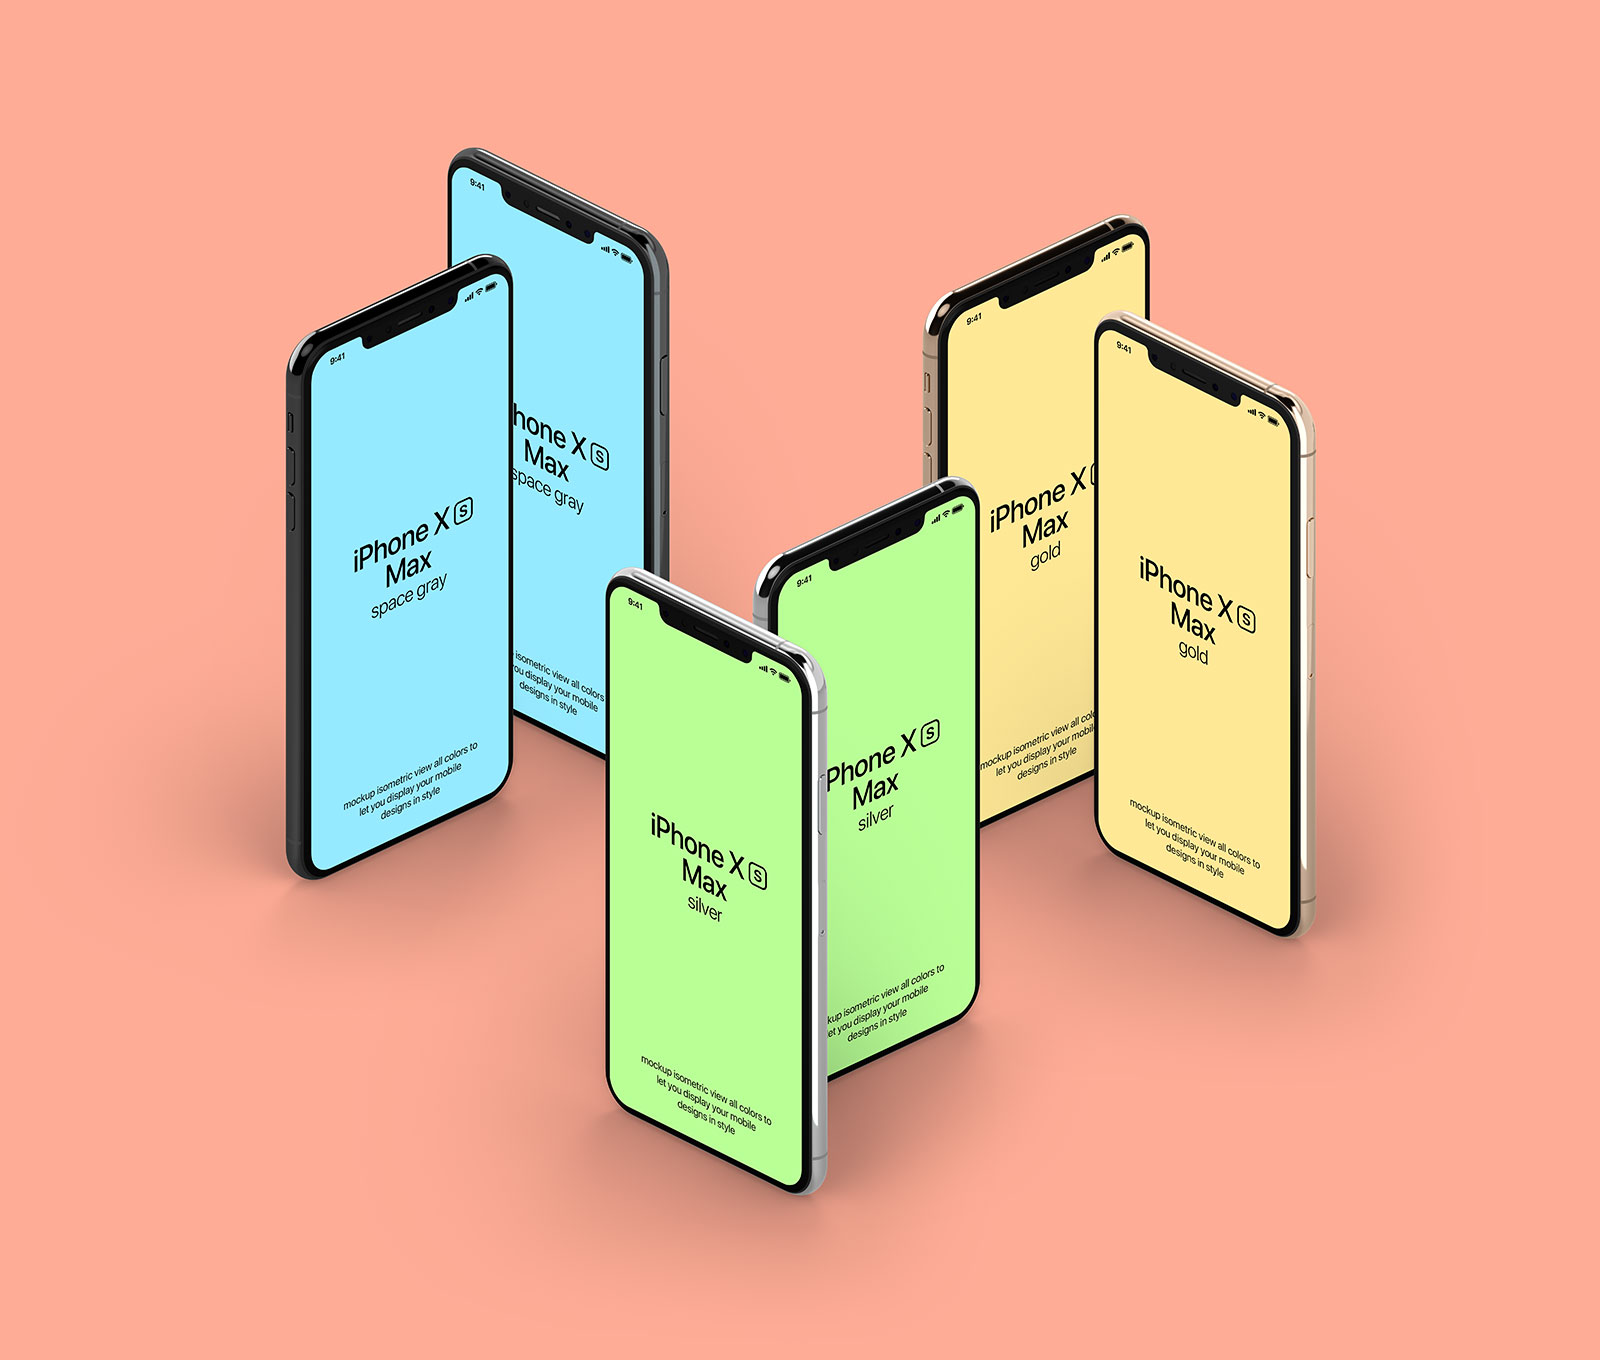 Free-Isometric-iPhone-Xs-Max-Mockup-PSD-2